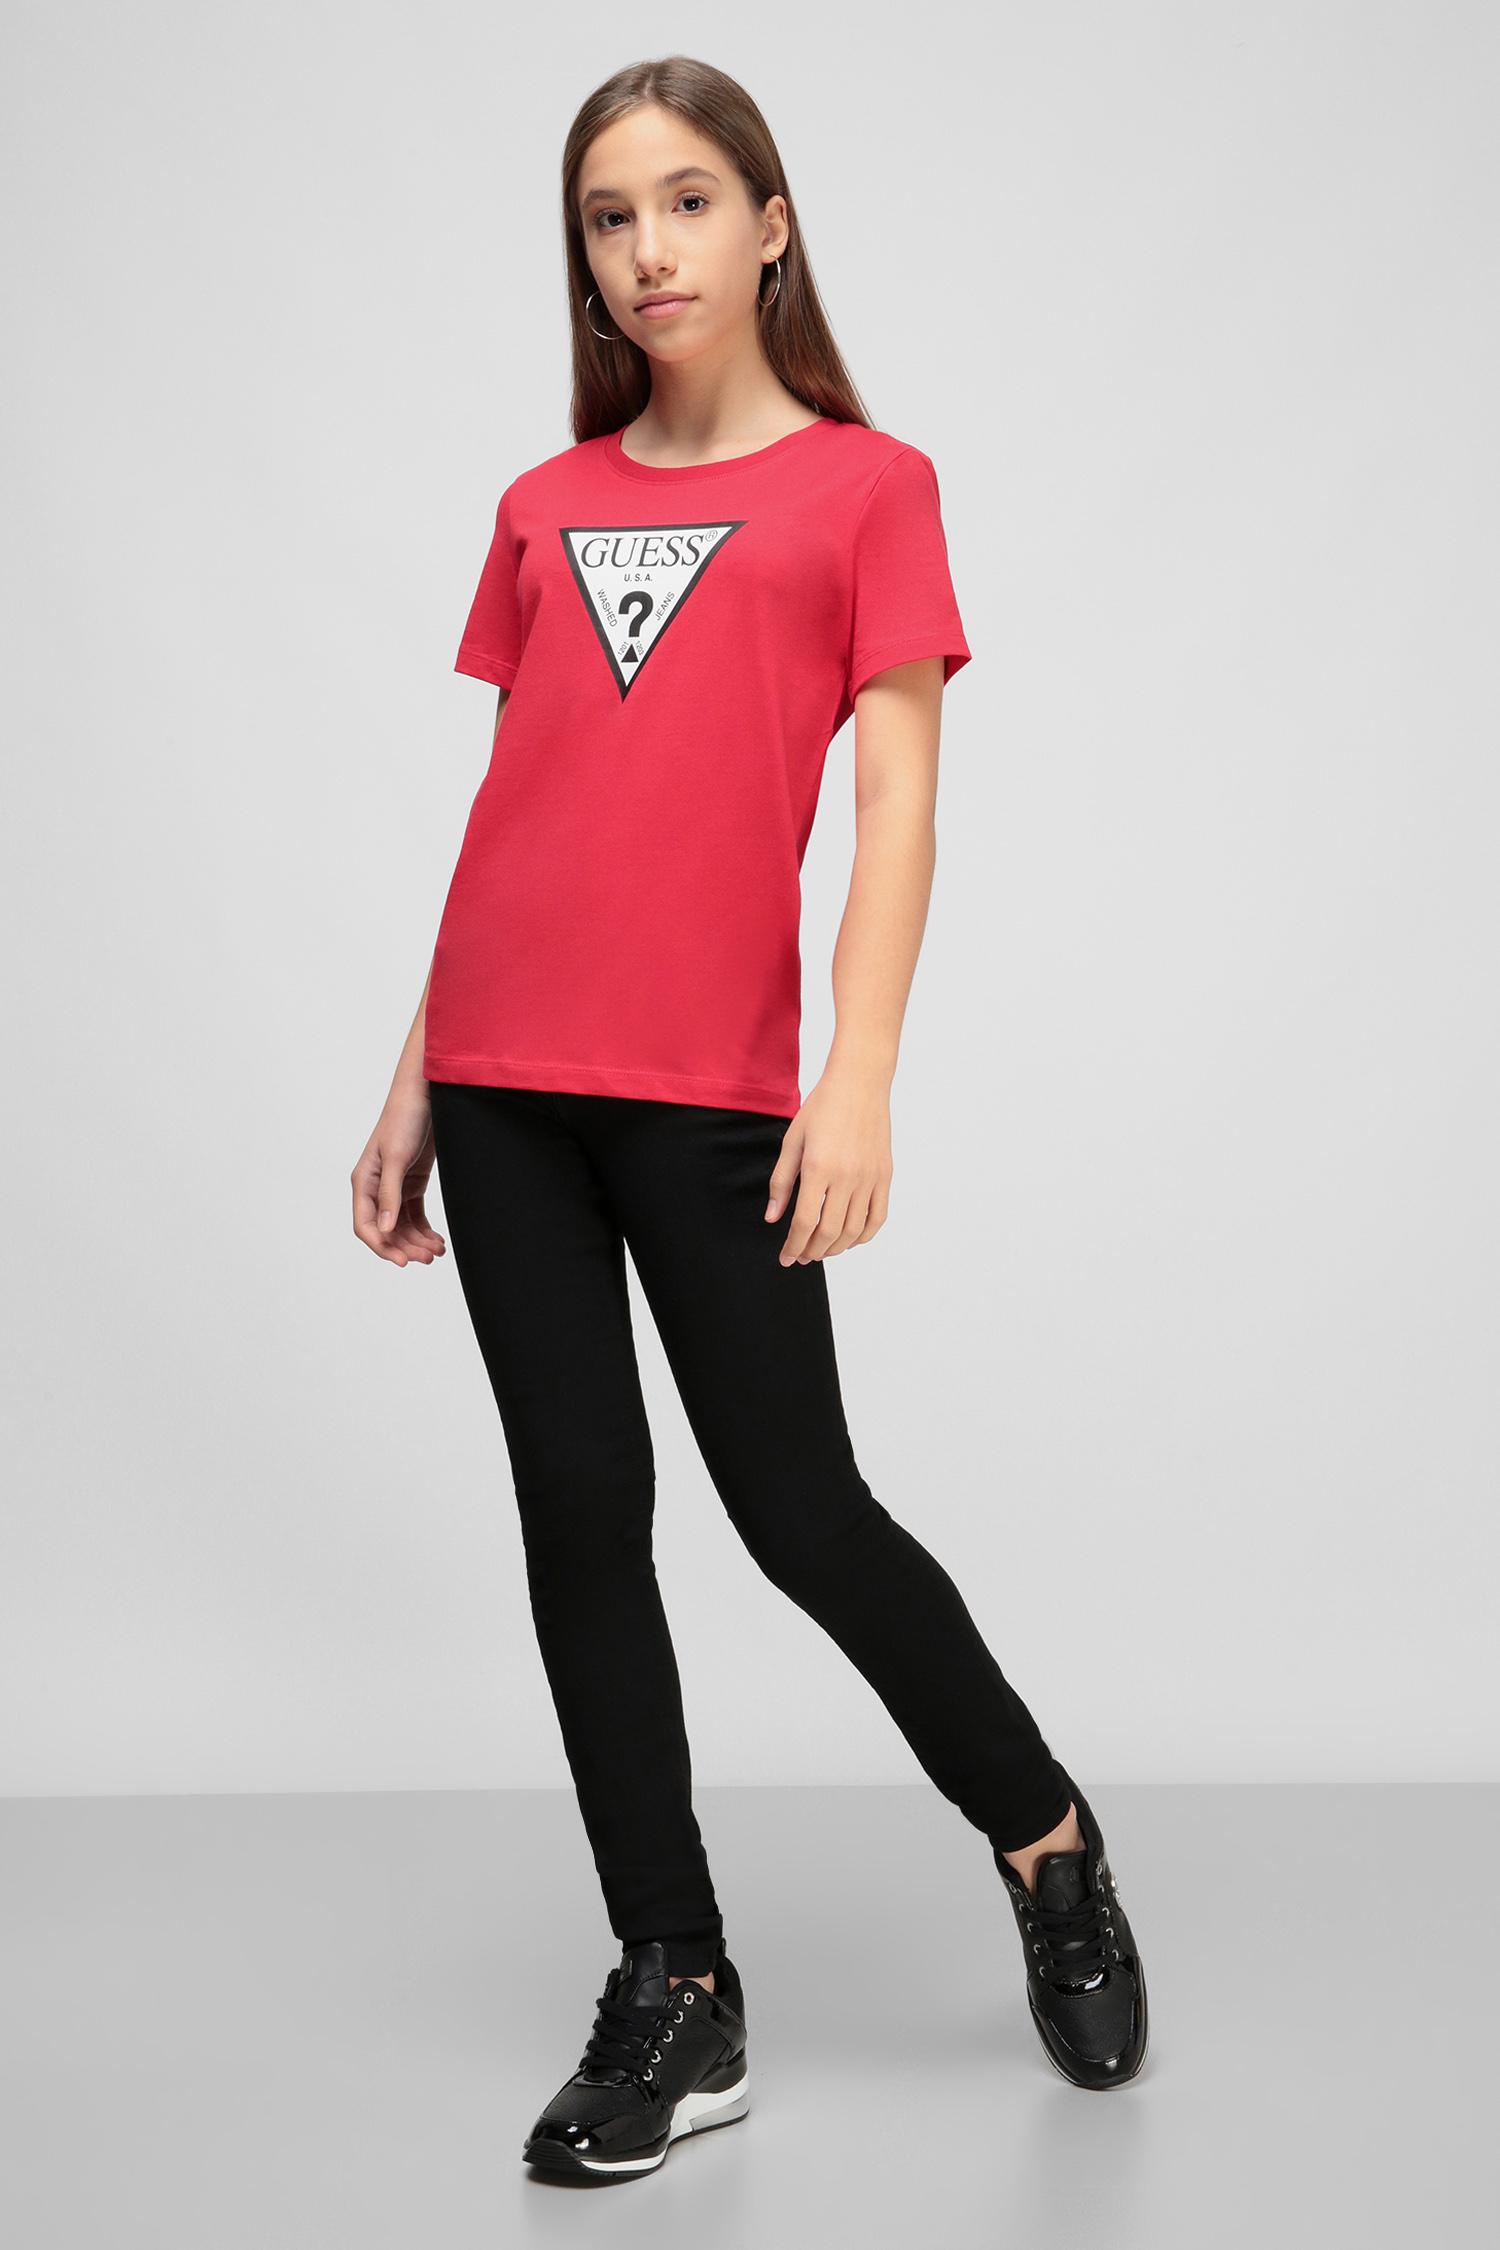 Красная футболка для девушек Guess W0BI25.I3Z11;G5F0